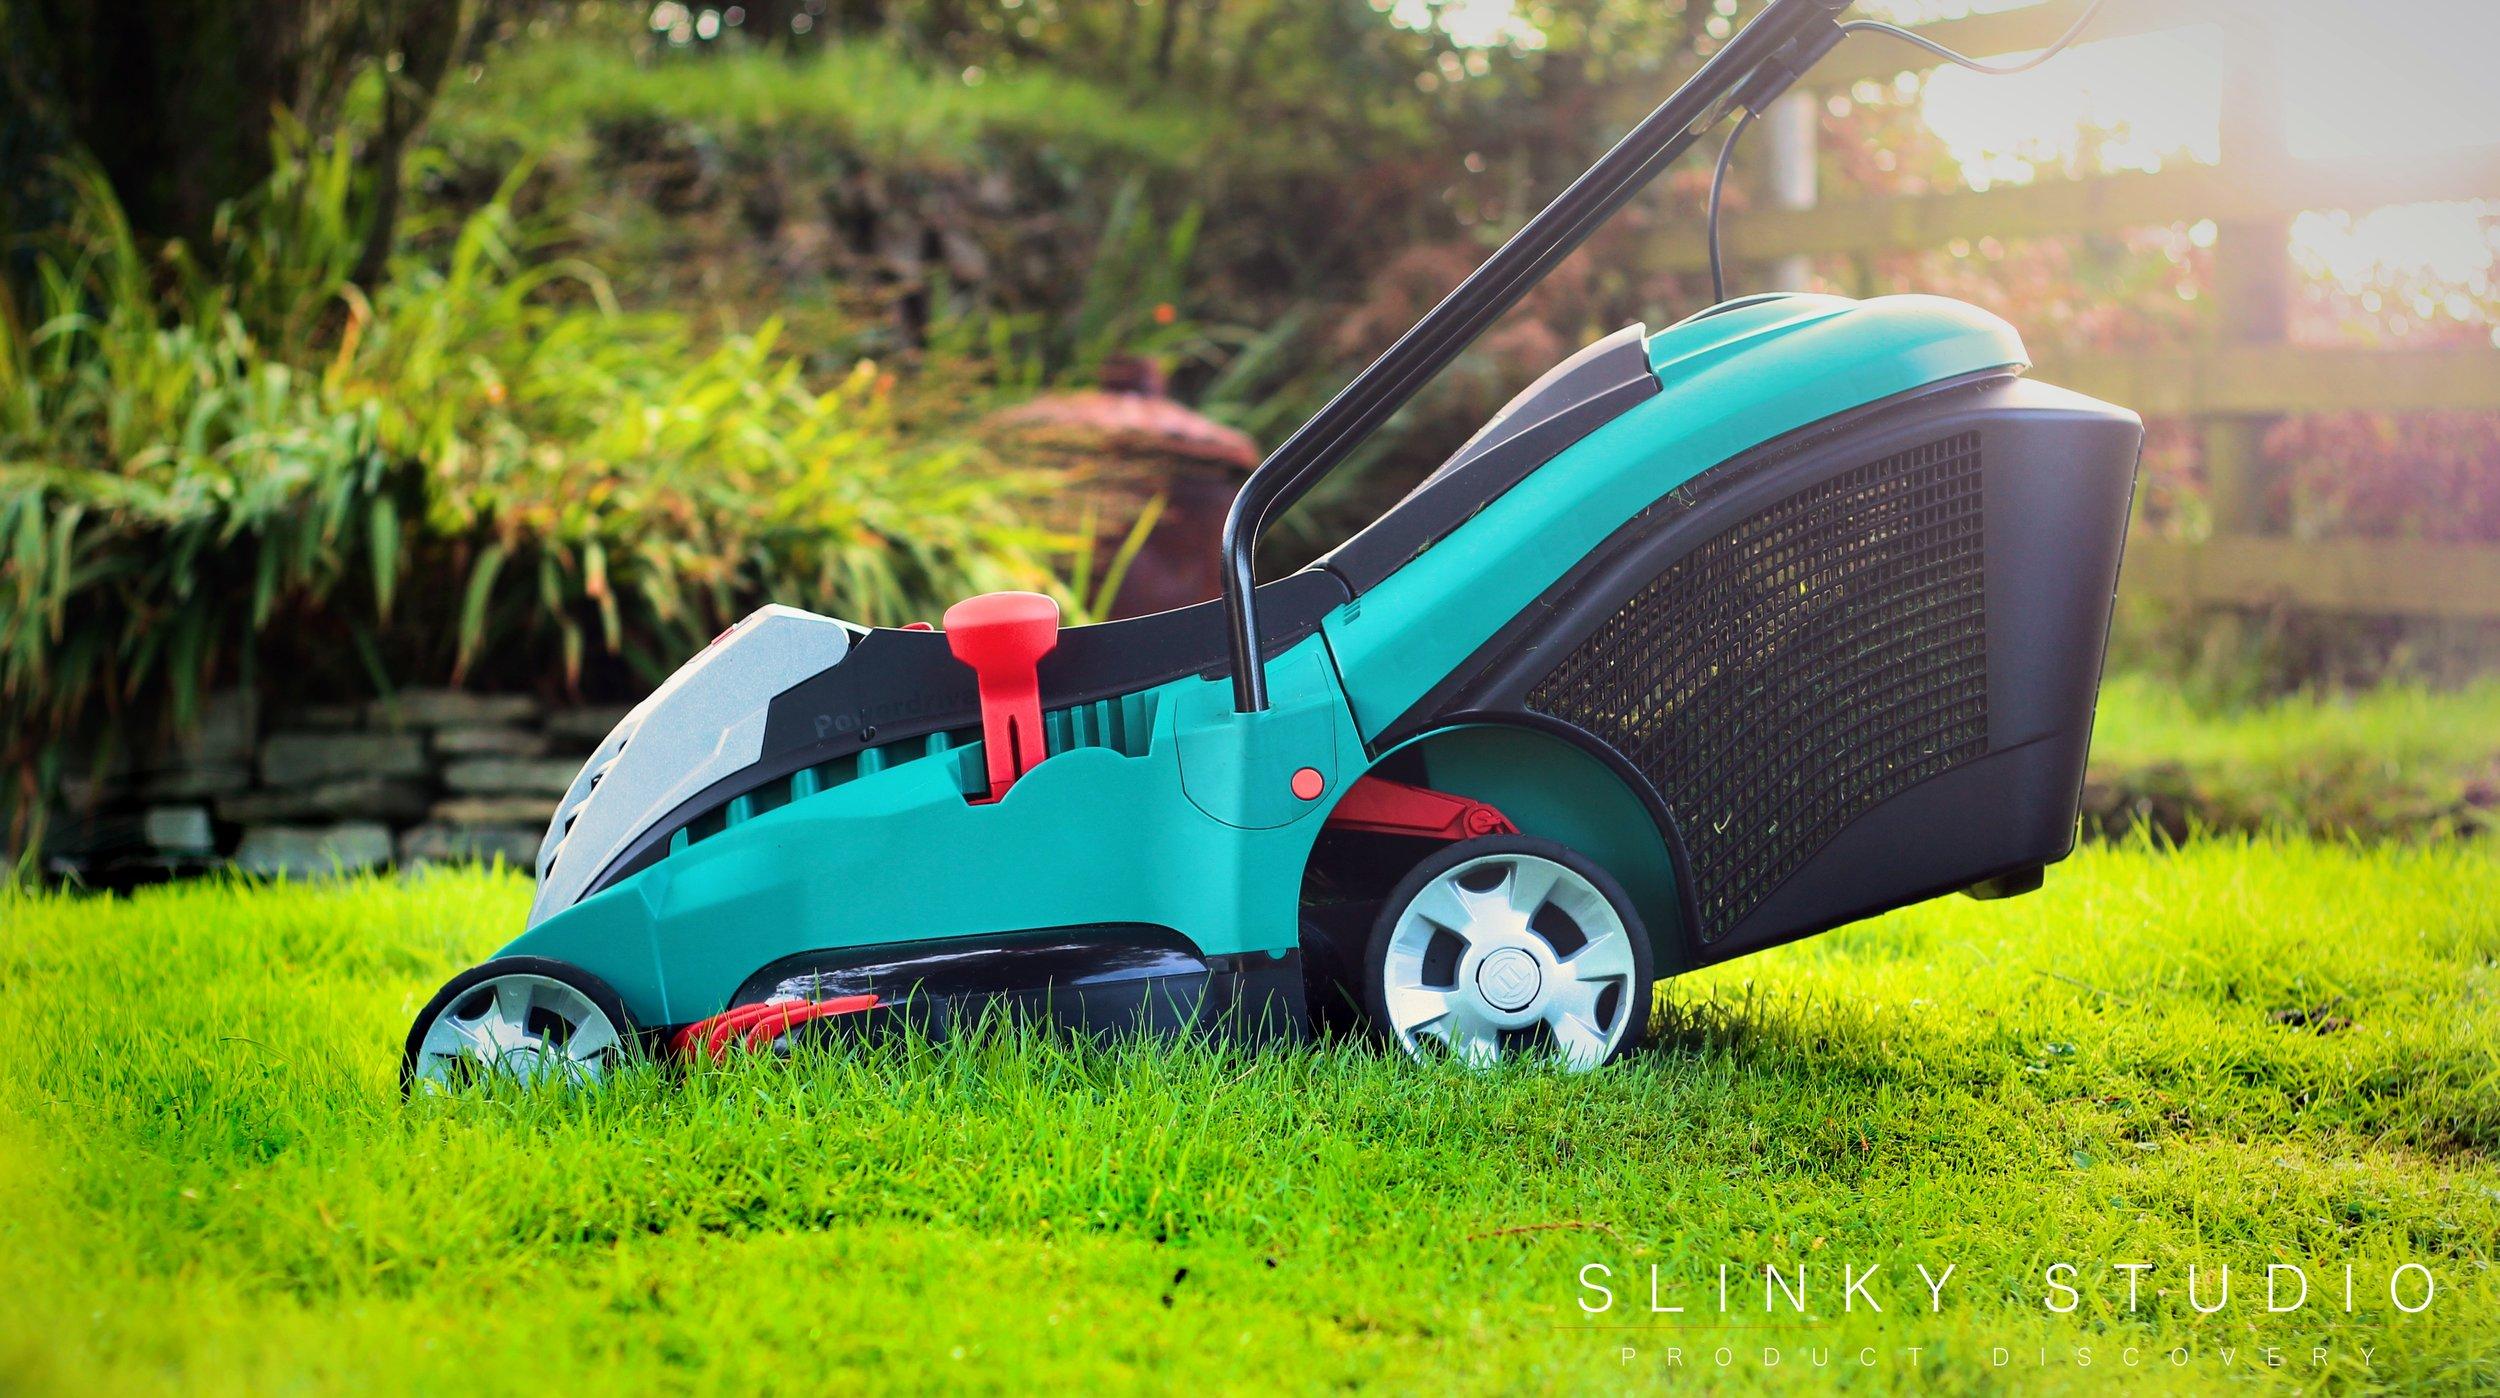 Bosch Rotak 43 LI Ergoflex Cordless Lawnmower Side View.jpg